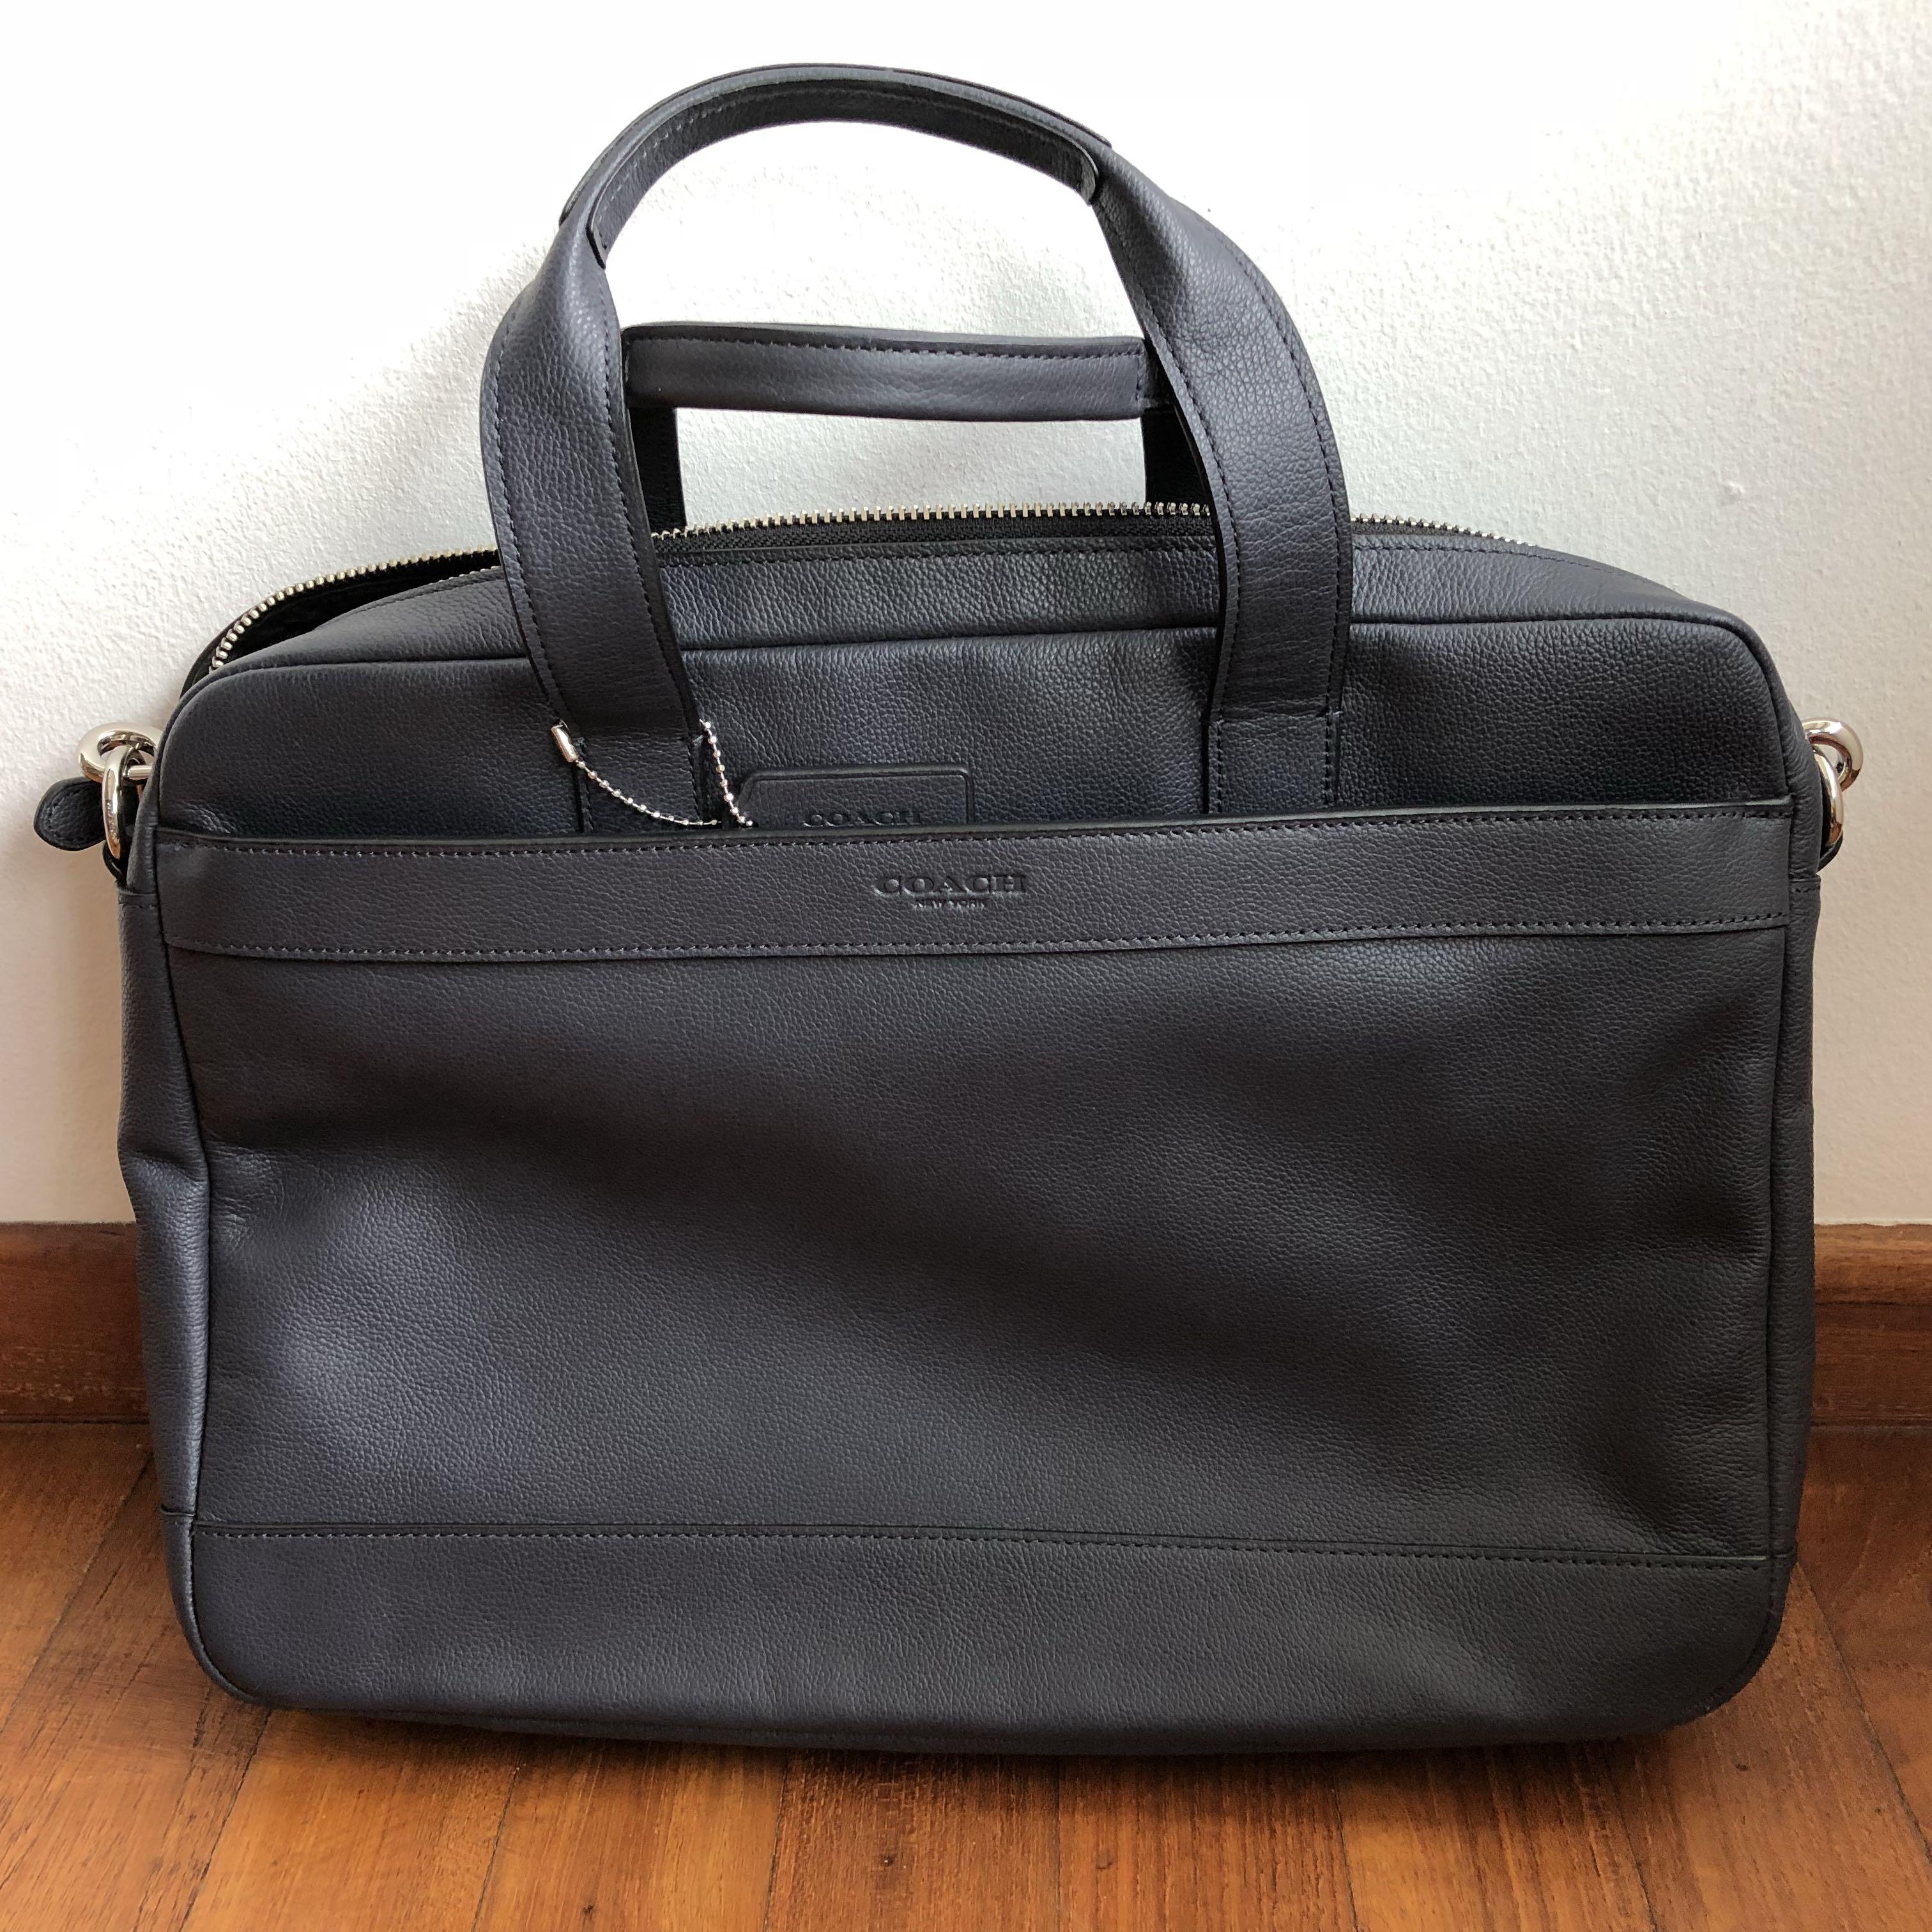 c51ced61c7 Coach Briefcase. Hamilton Bag